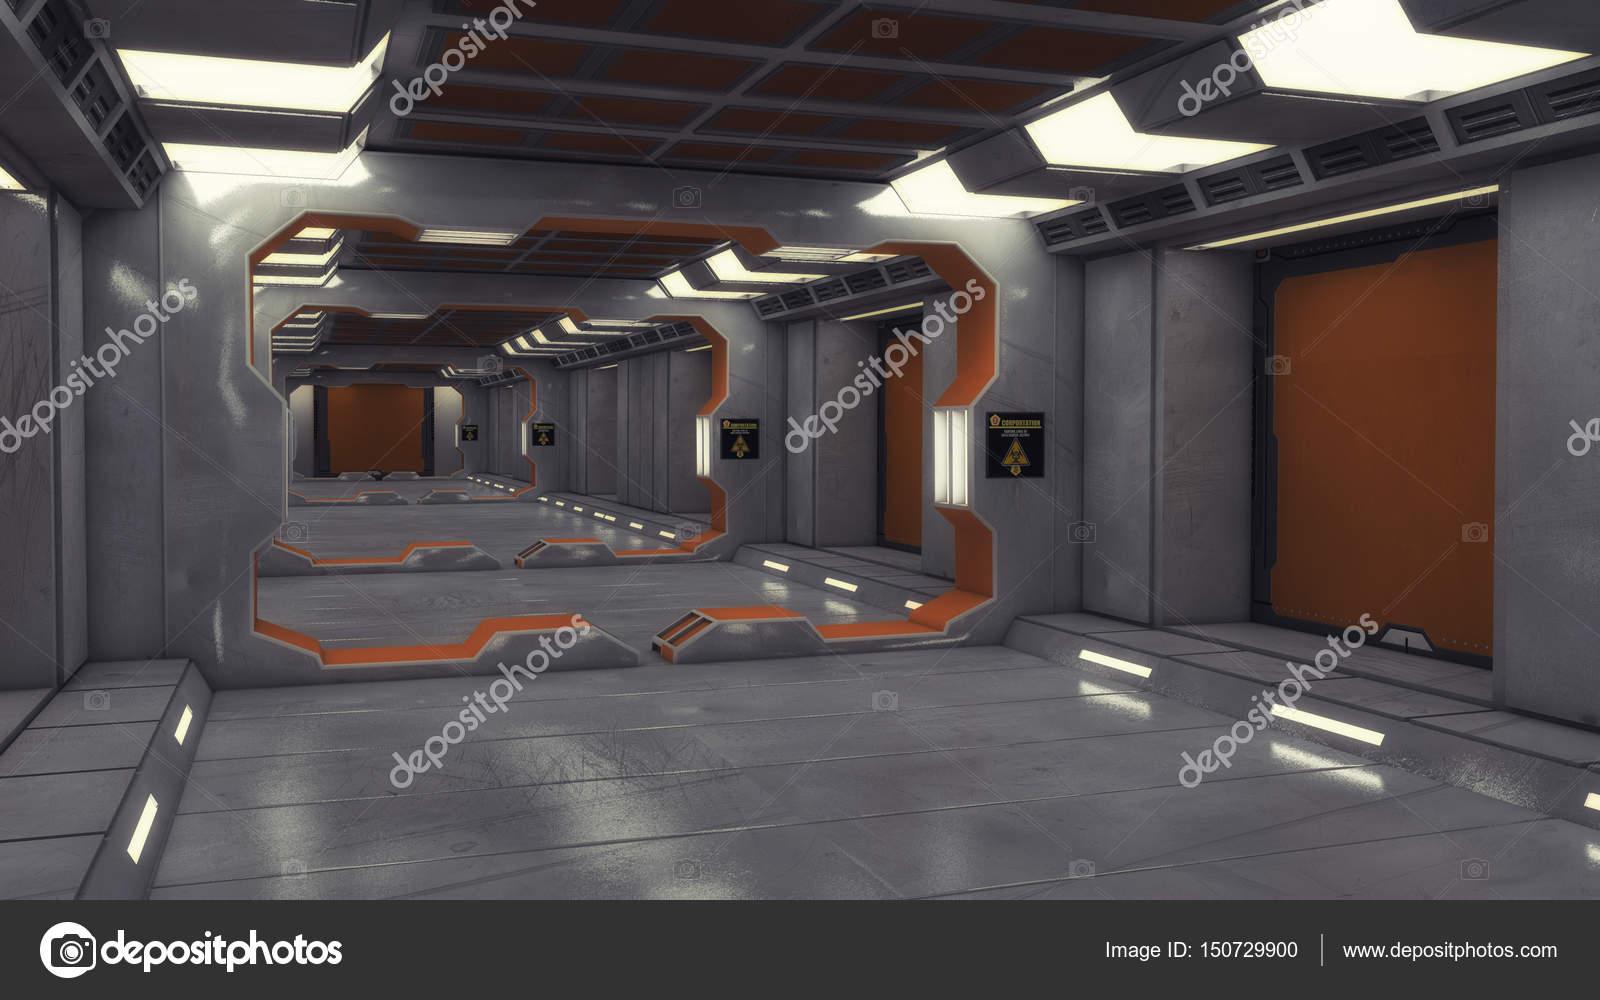 3d render fondo del pasillo interior de nave espacial for Interior nave espacial